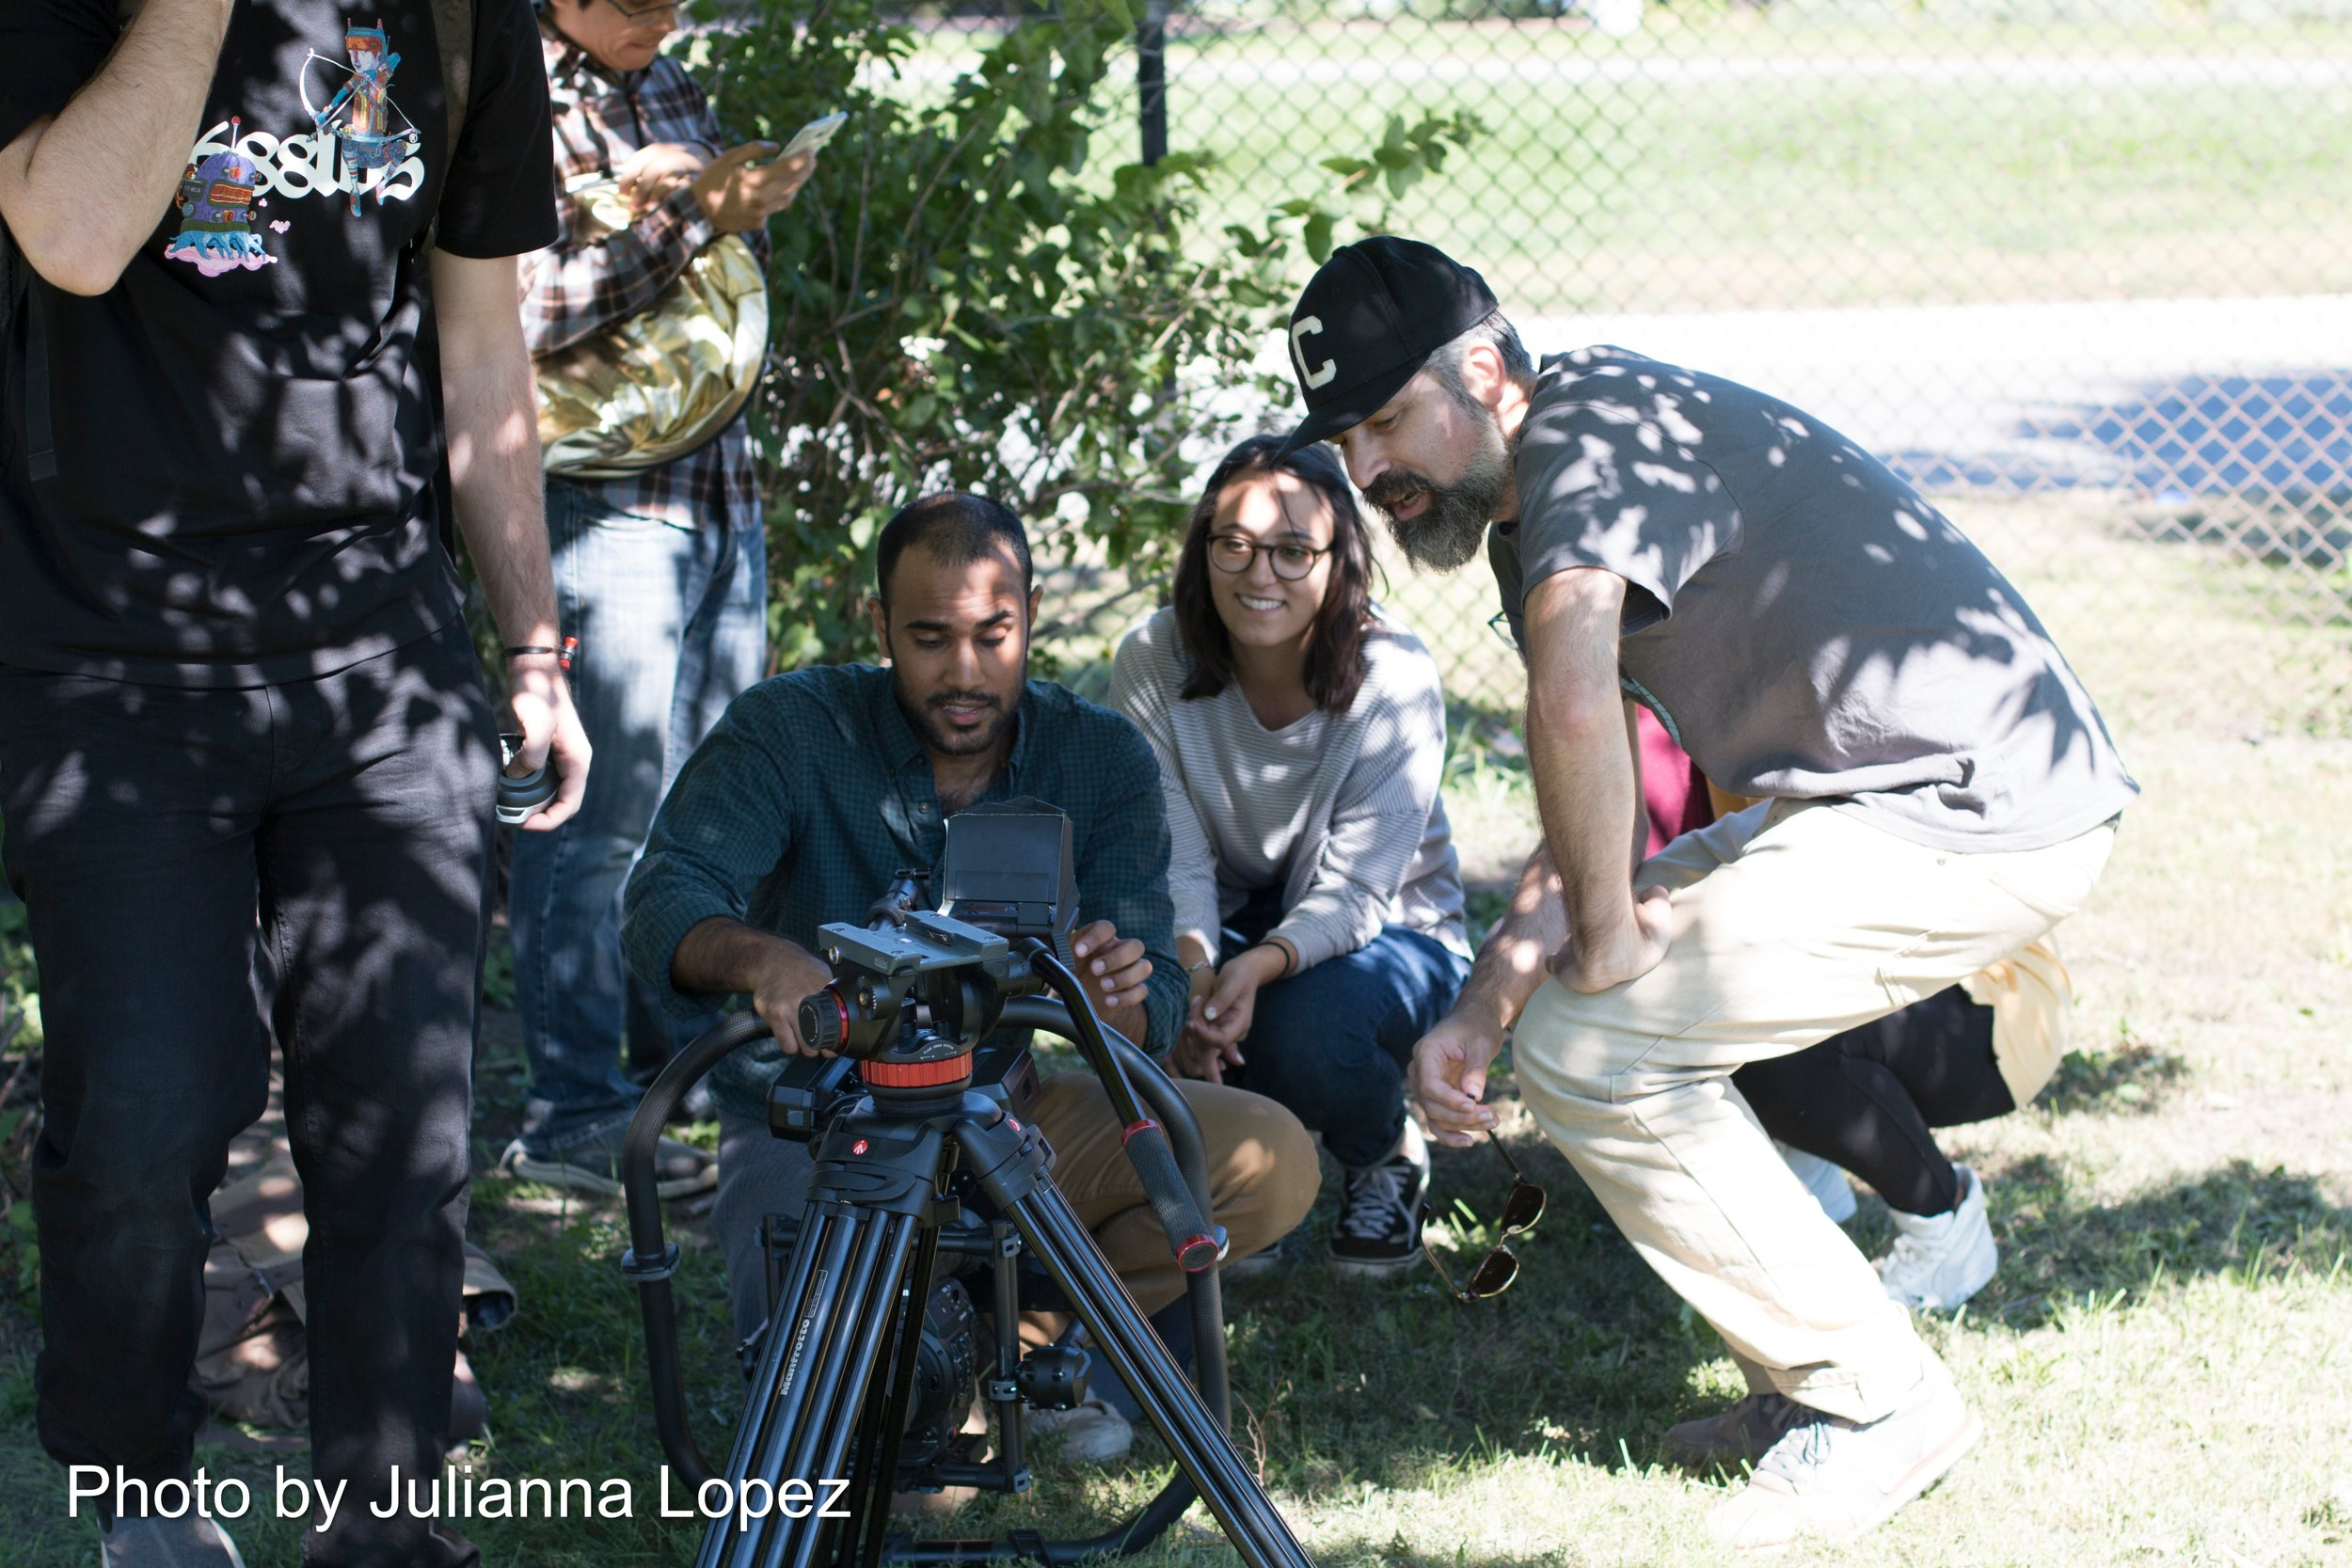 Julianna Lopez - IMG_6499.jpg